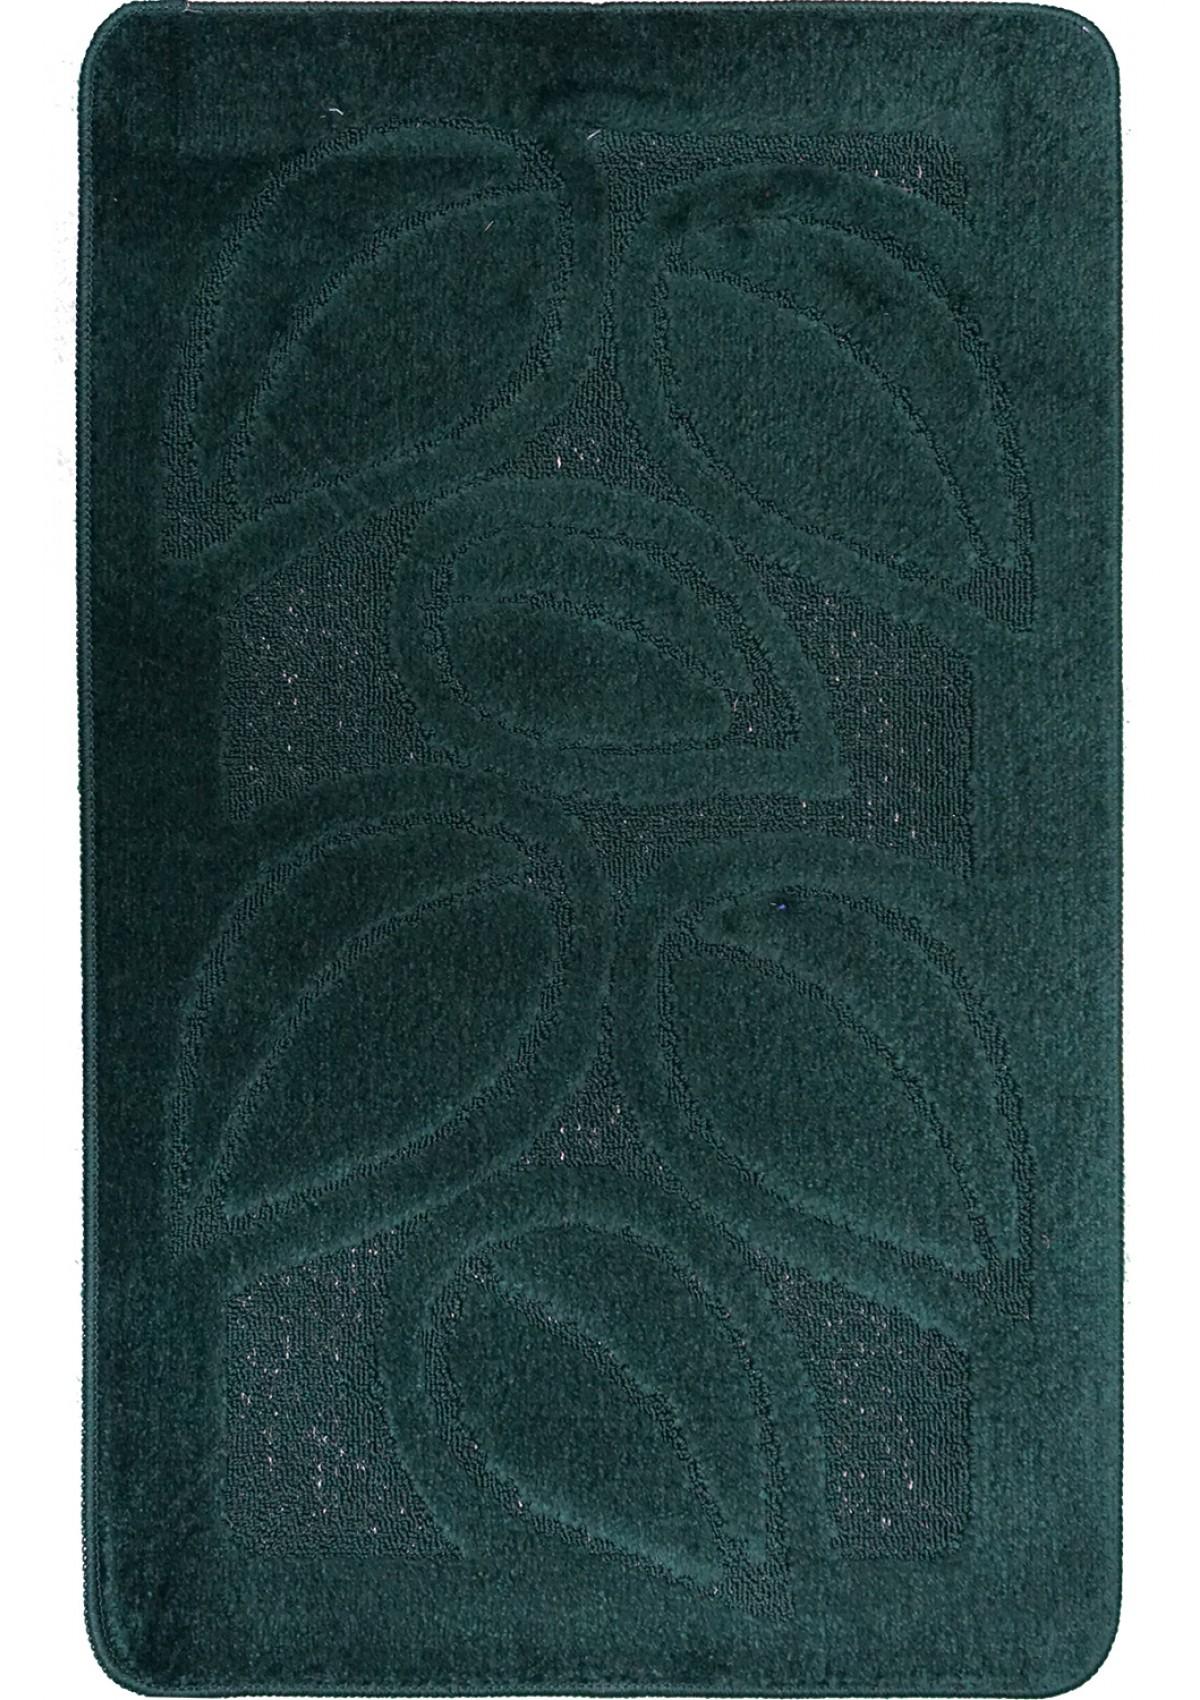 Килимок FLORA 2536 pc1 HUNTER GREEN